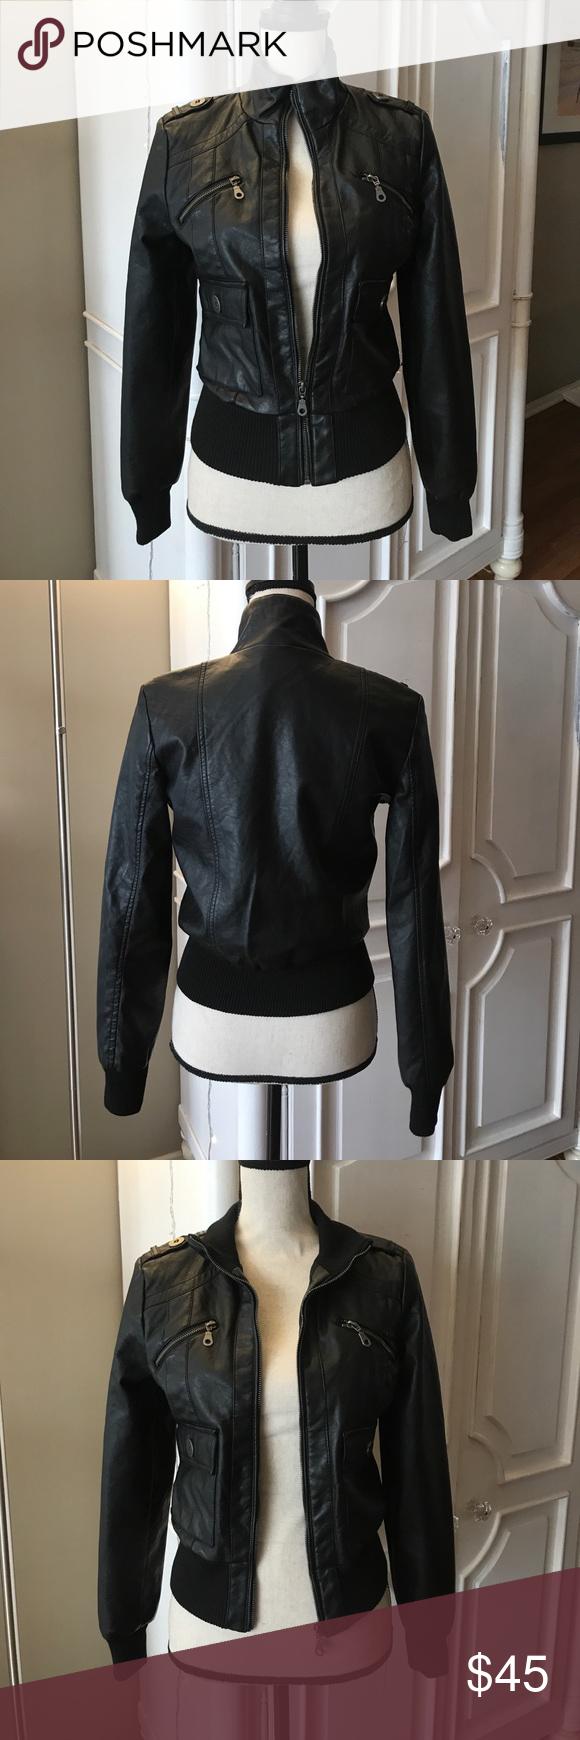 Vegan leather black bomber jacket Boutique Black bomber